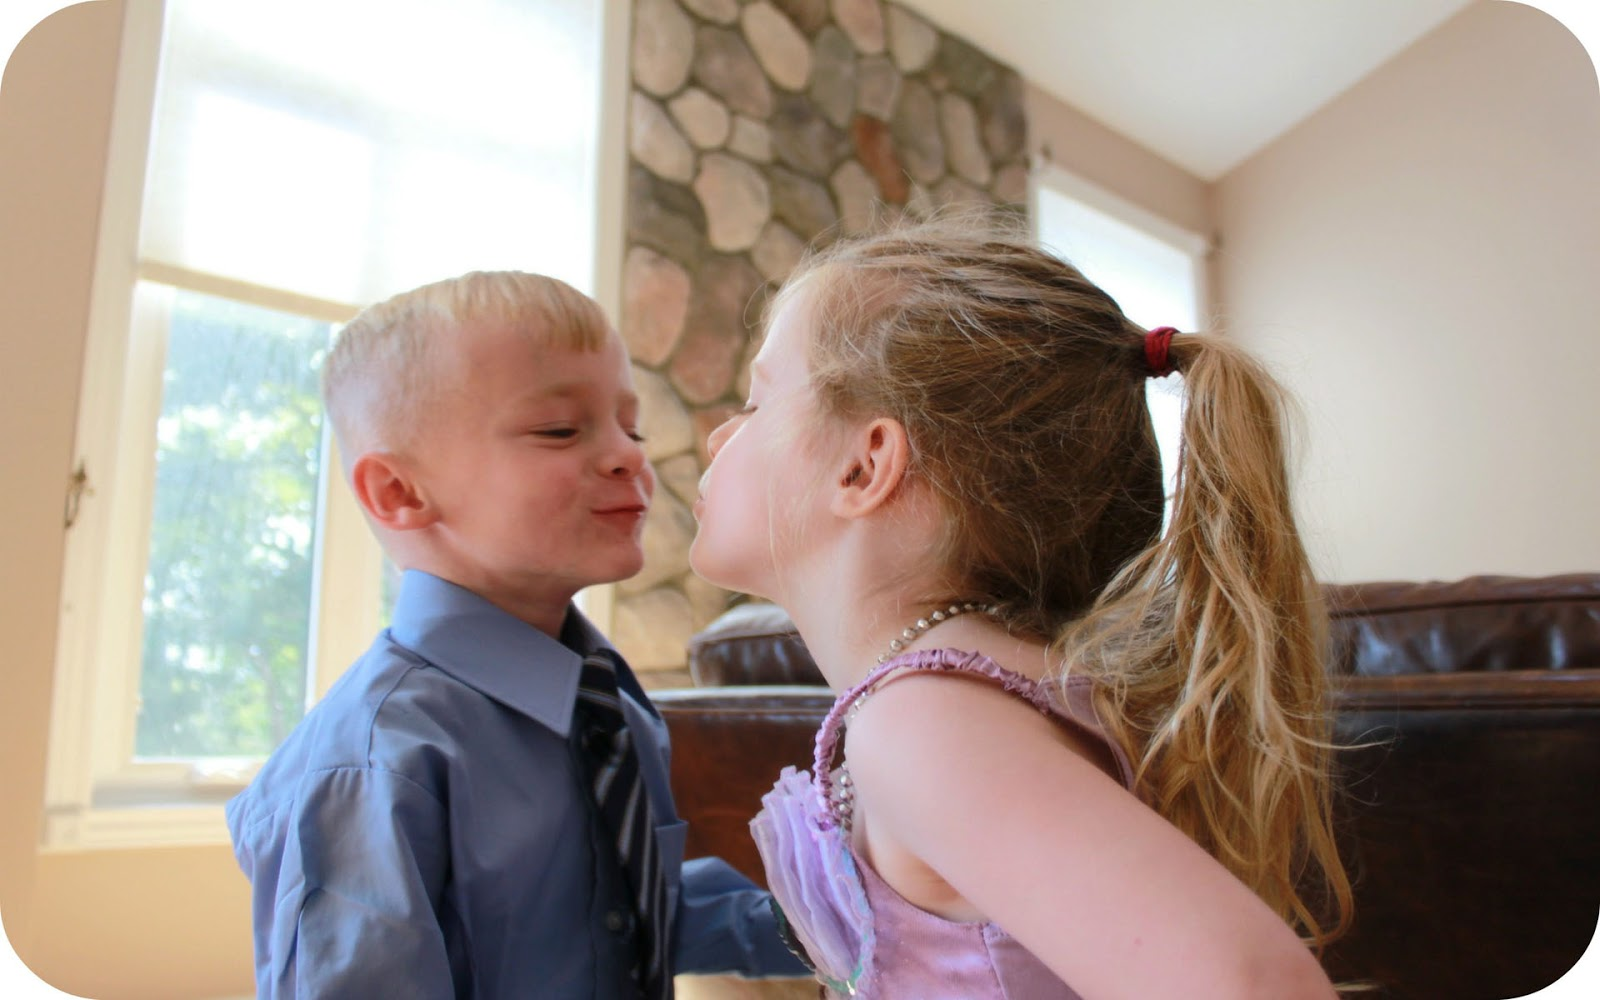 Boy Girl Lip Kiss Photo